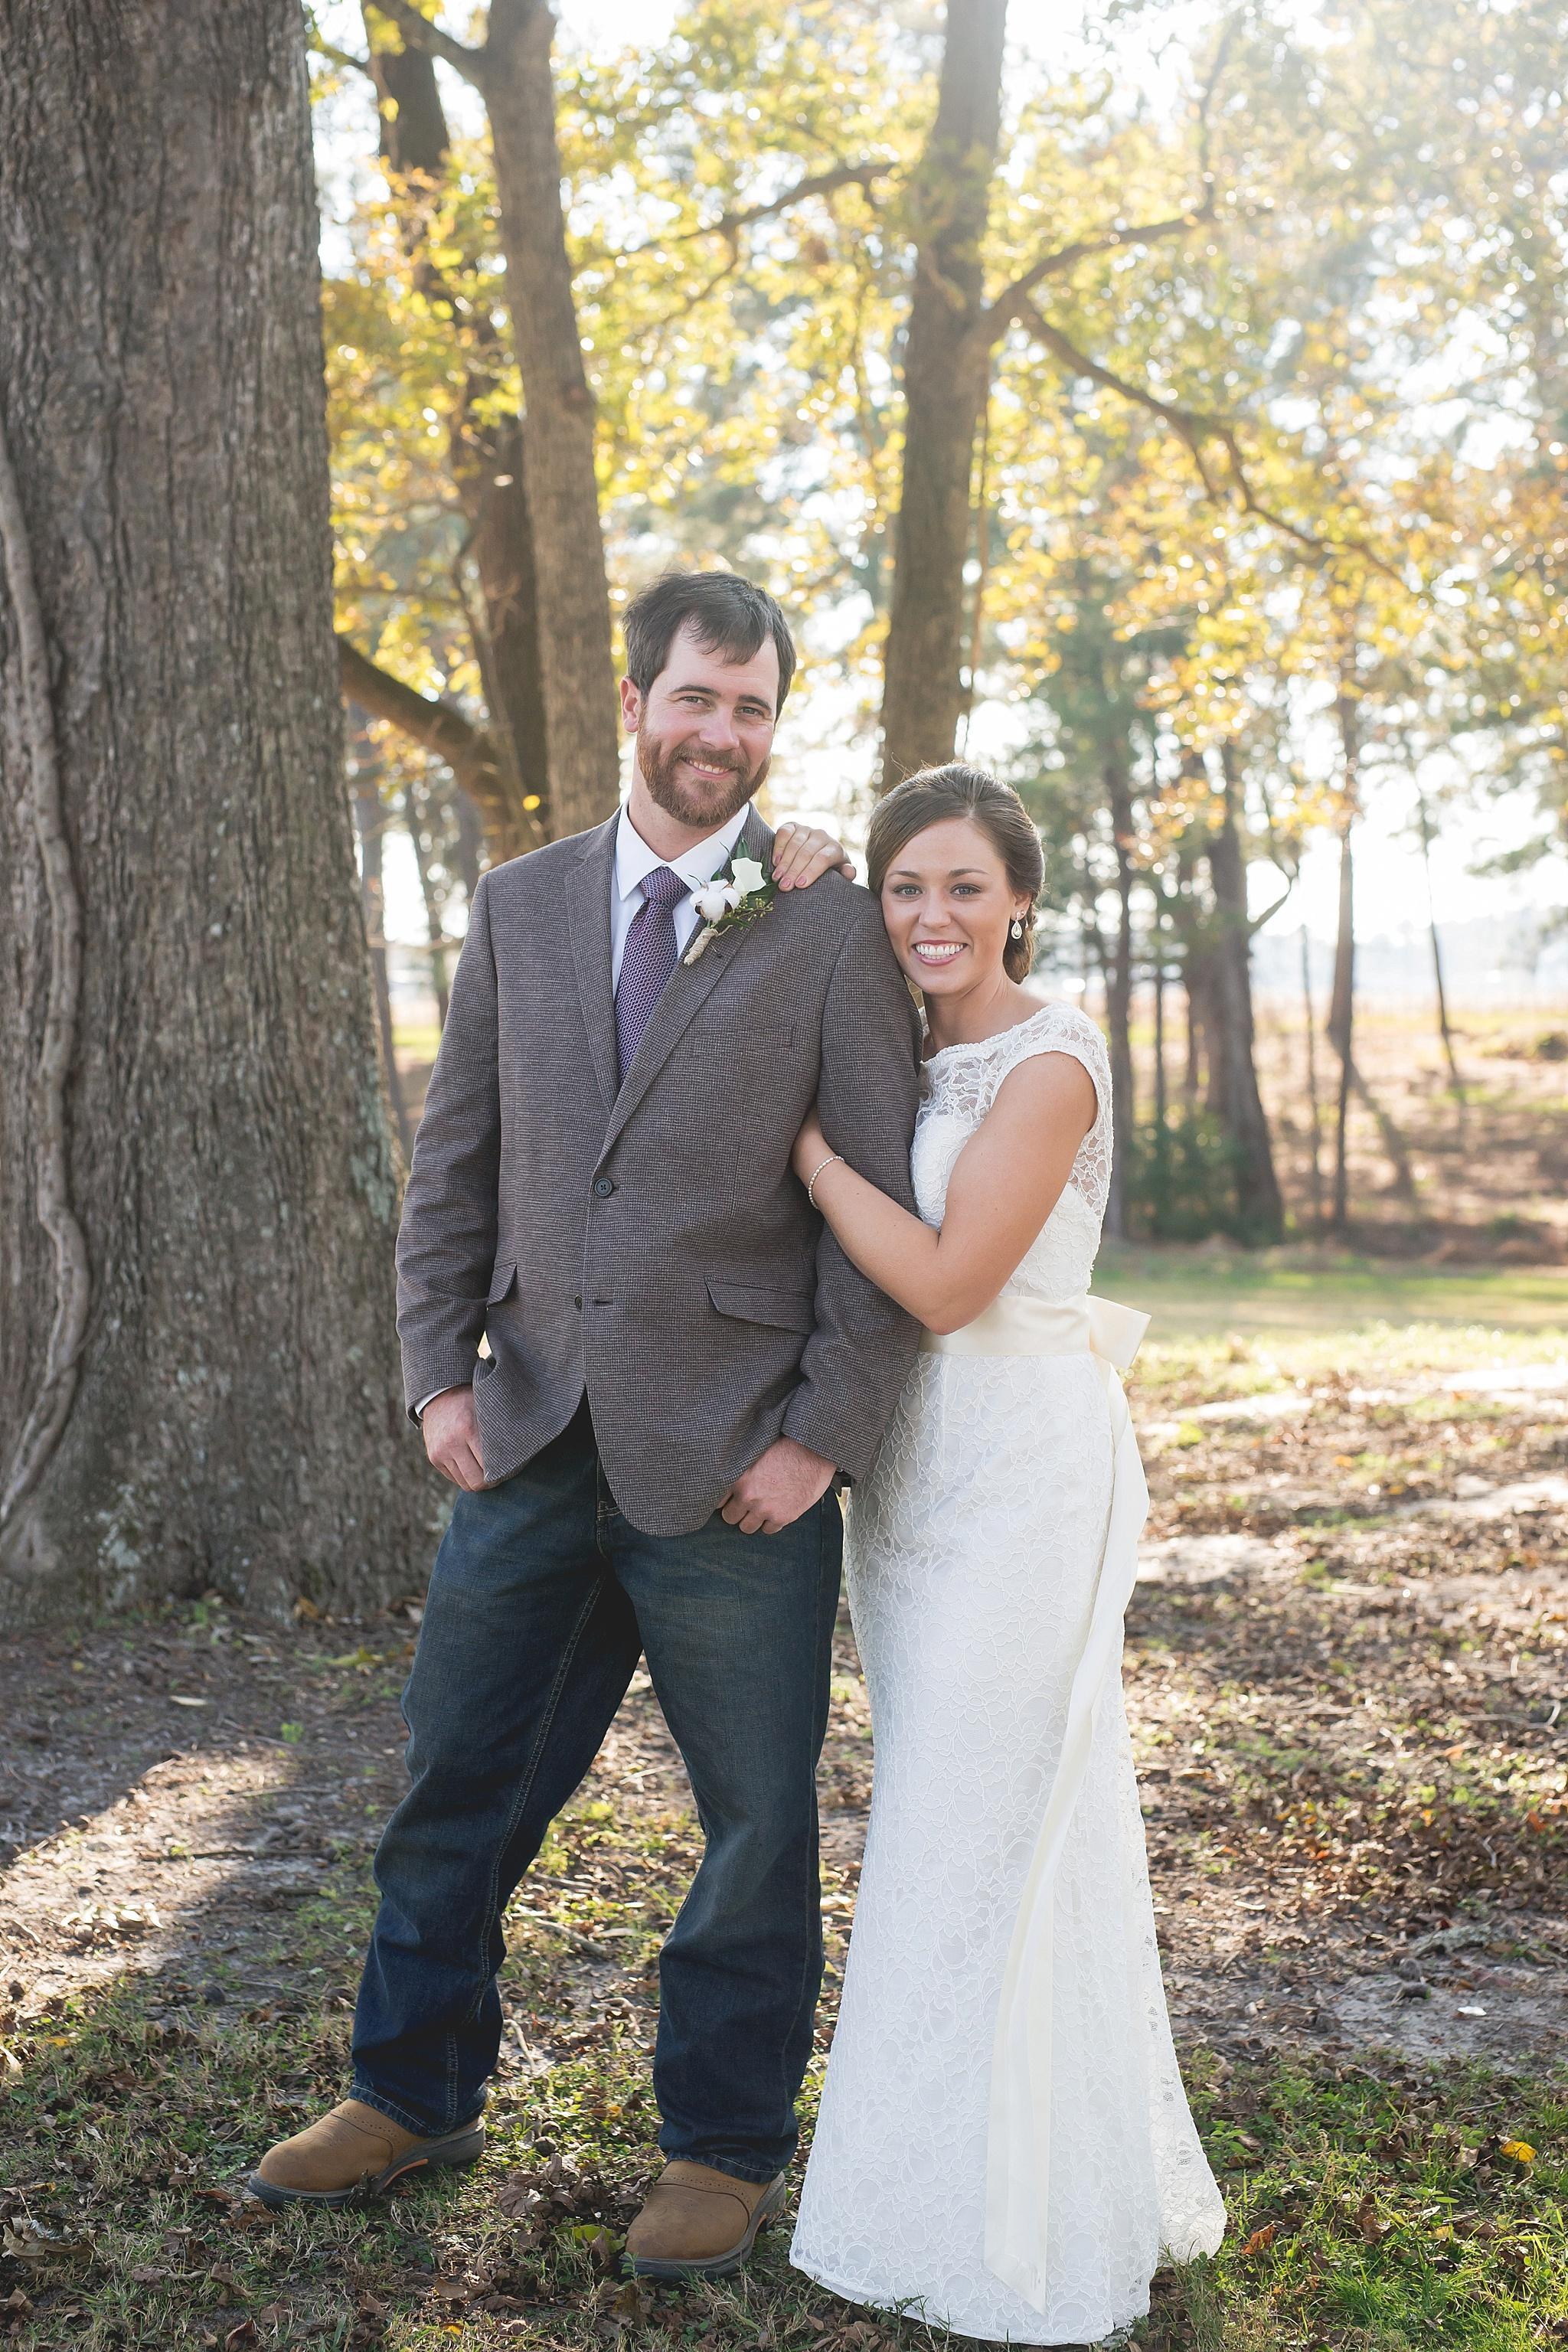 May-Lew-Farm-Farmville-NC-Wedding-Photographer-074.jpg